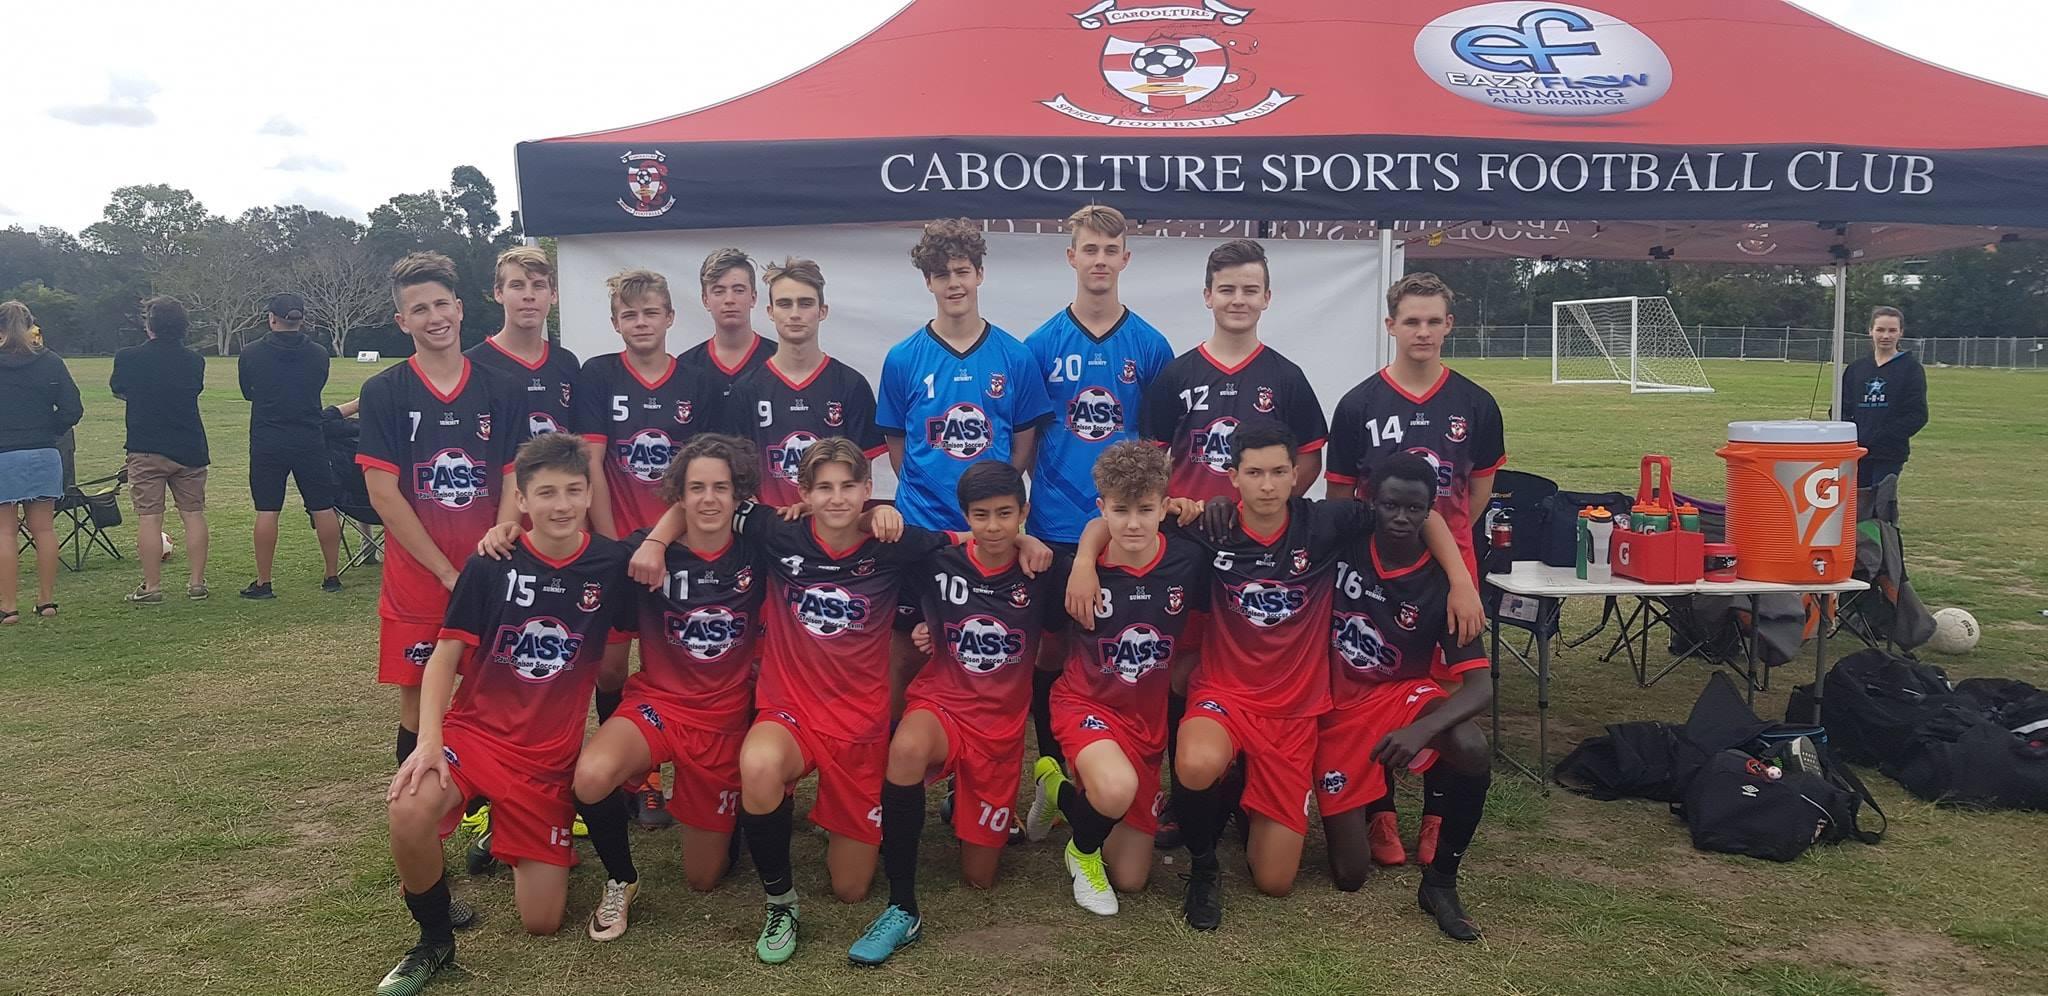 Caboolture Sports Football Club